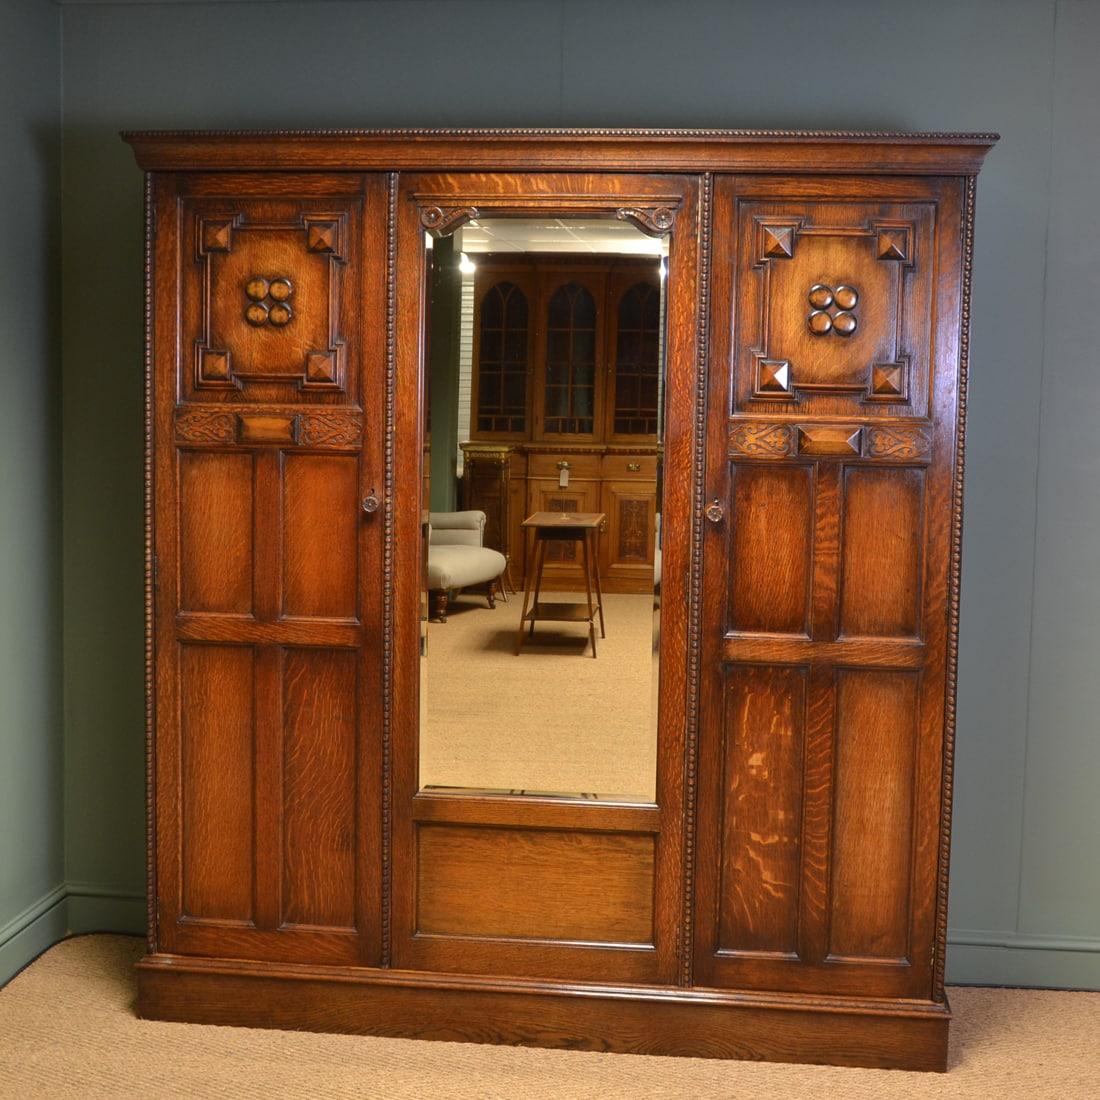 Waring and Gillows Edwardian Oak Antique Triple Wardrobe